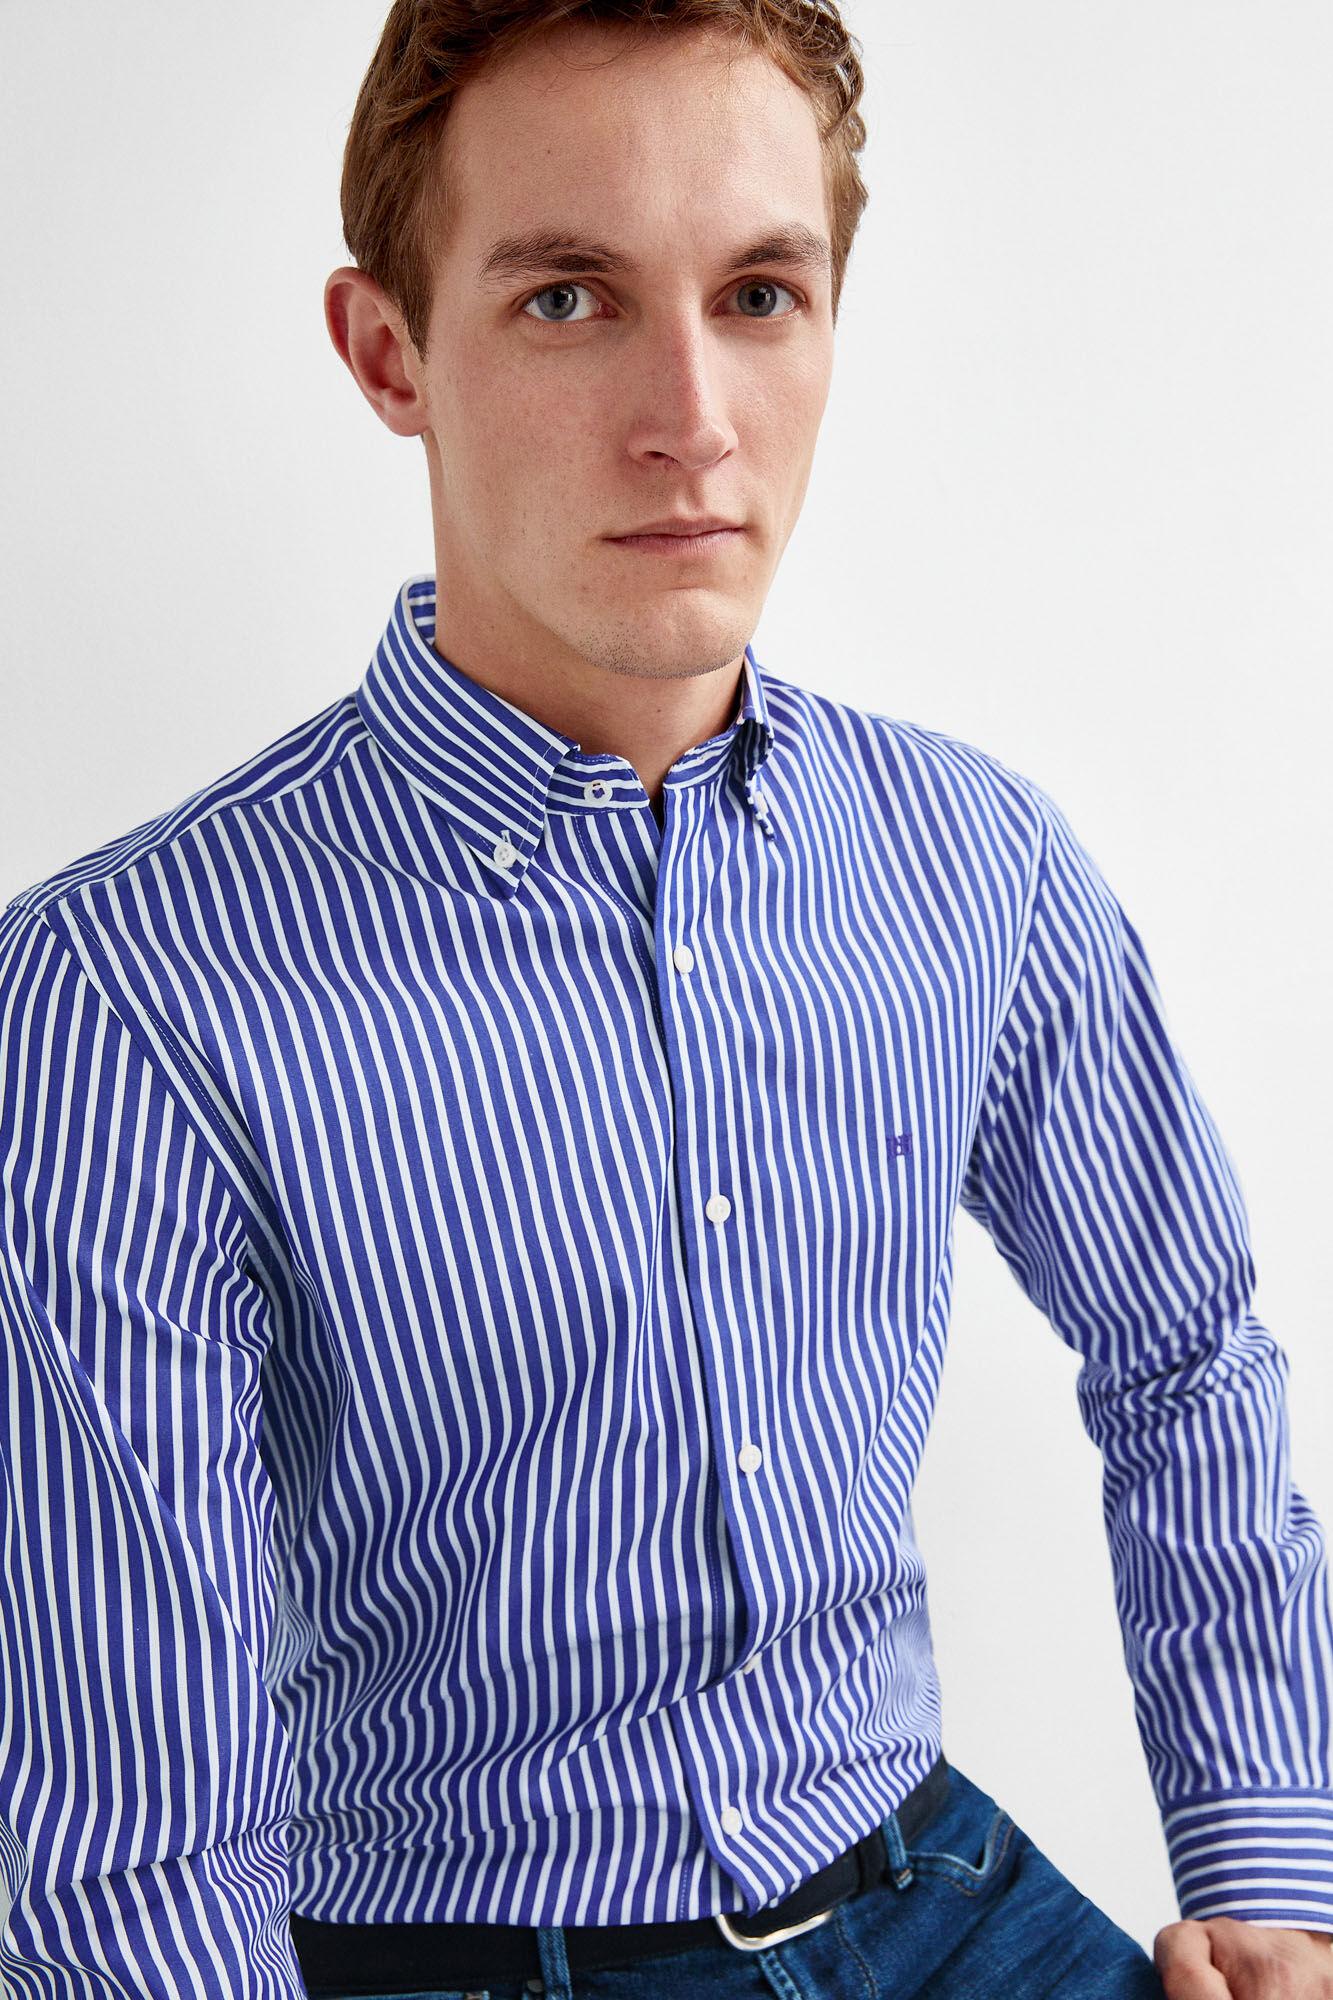 968ef199306de0 Striped shirt with button down collar | Shirts | Pedro del Hierro ...